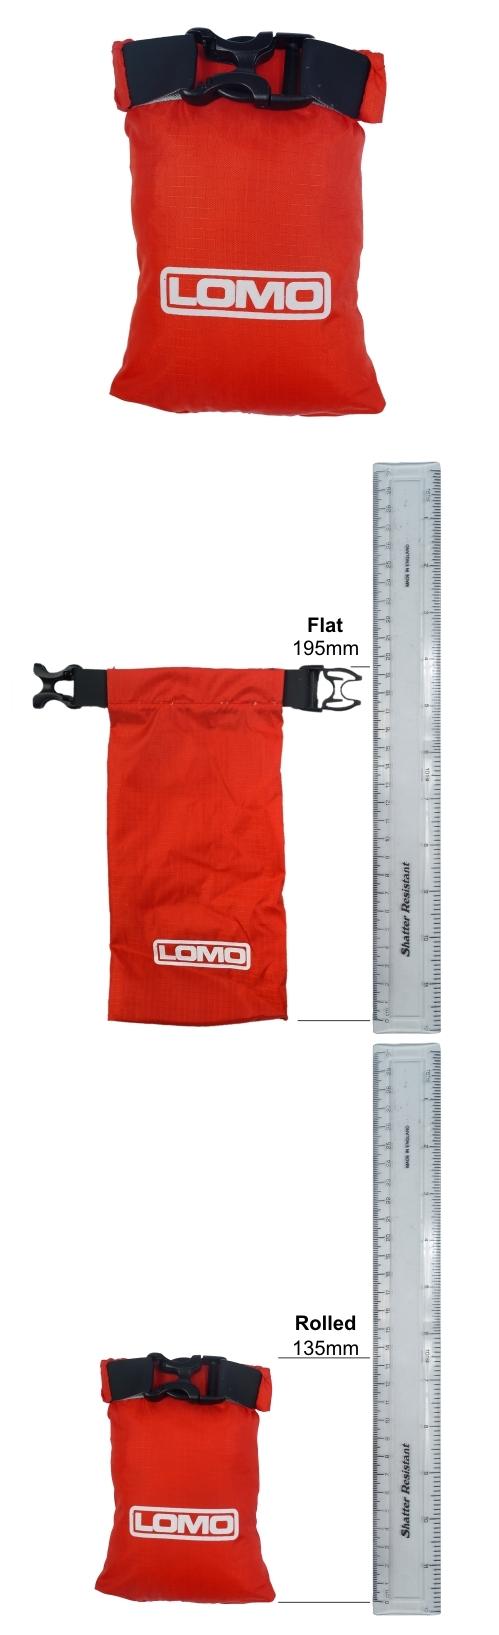 0.3L Ultra Lightweight Dry Bag  - _0-3l-lightweight-dry-bag-1403000104